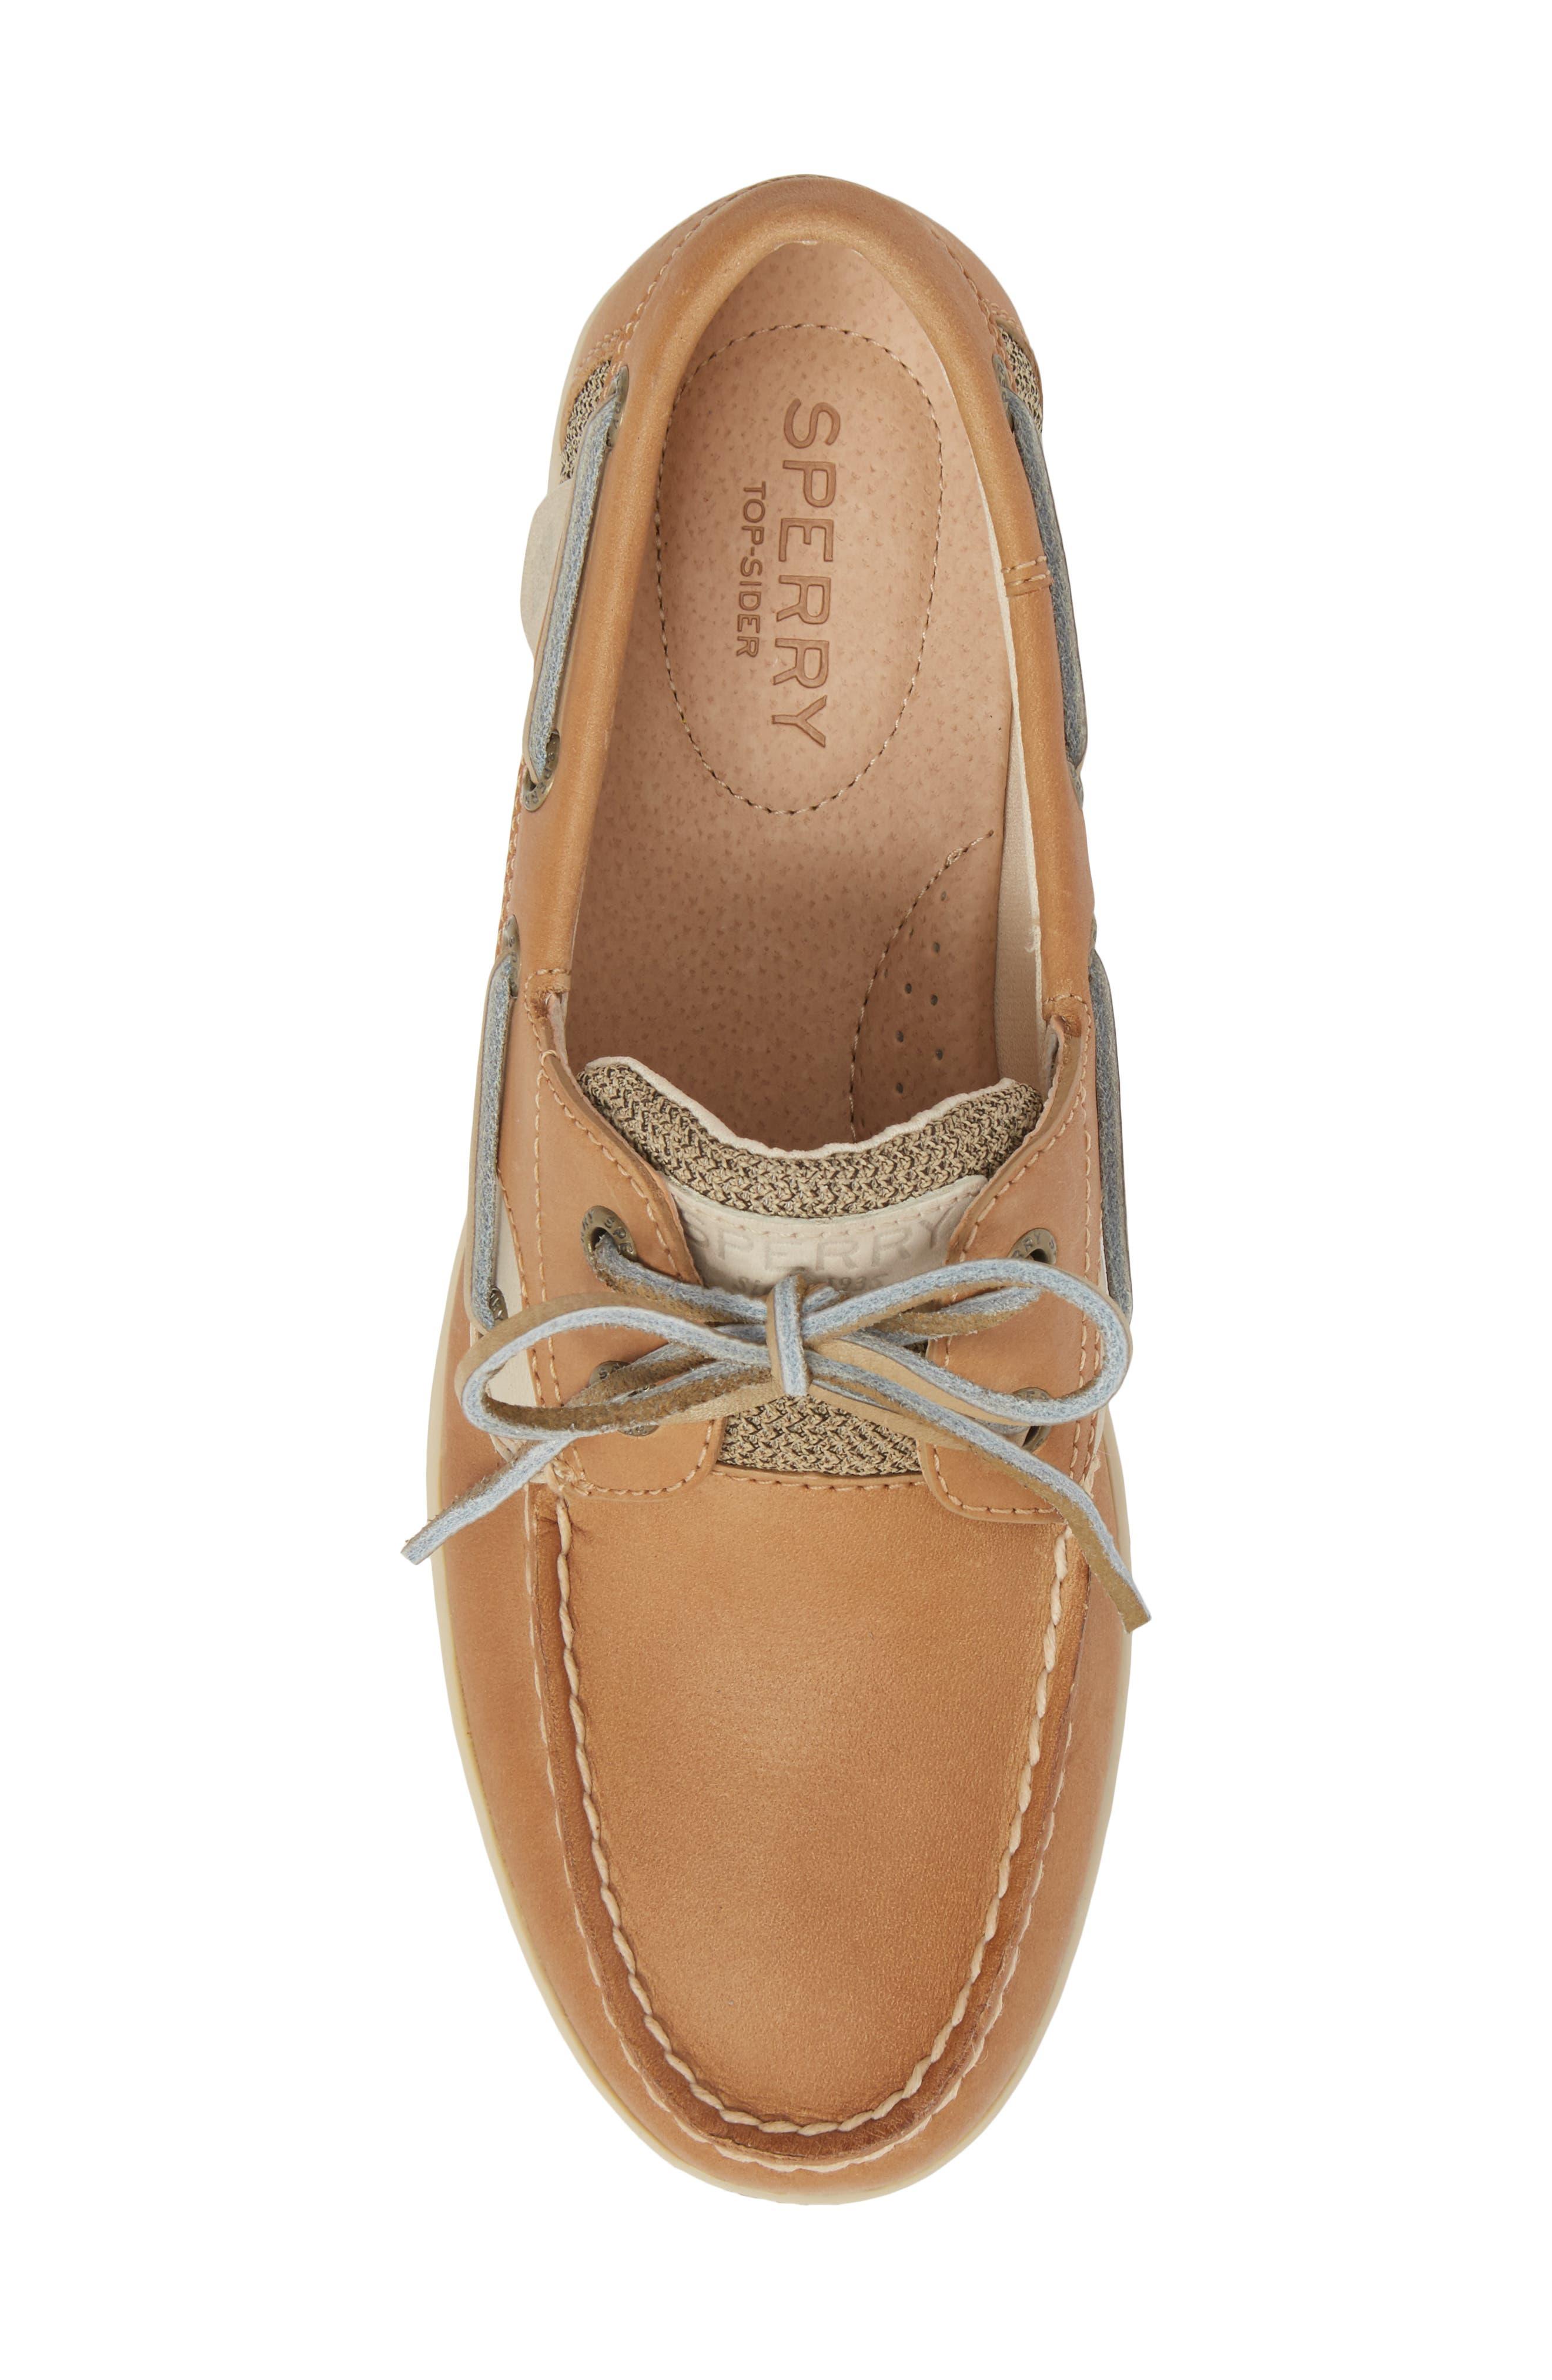 Top-Sider Koifish Loafer,                             Alternate thumbnail 5, color,                             Linen Oat Leather